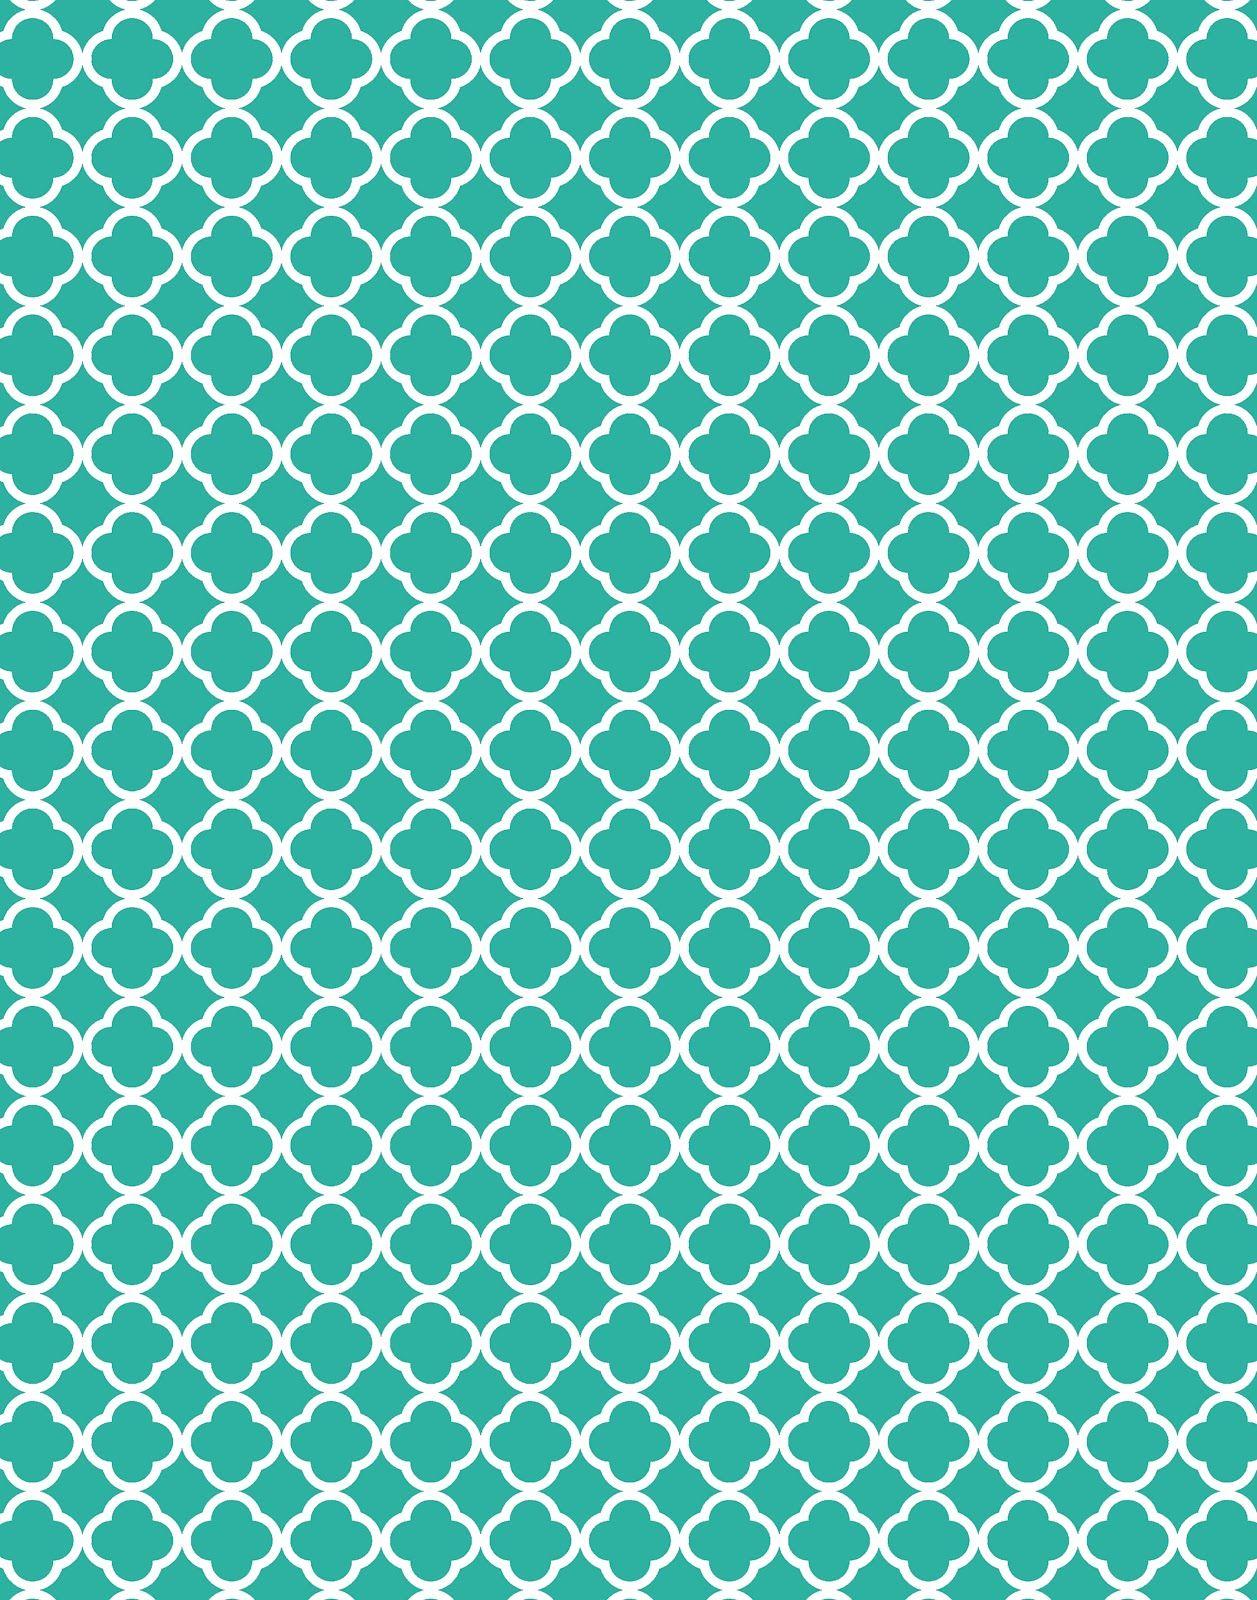 quatrefoil pattern background - photo #20